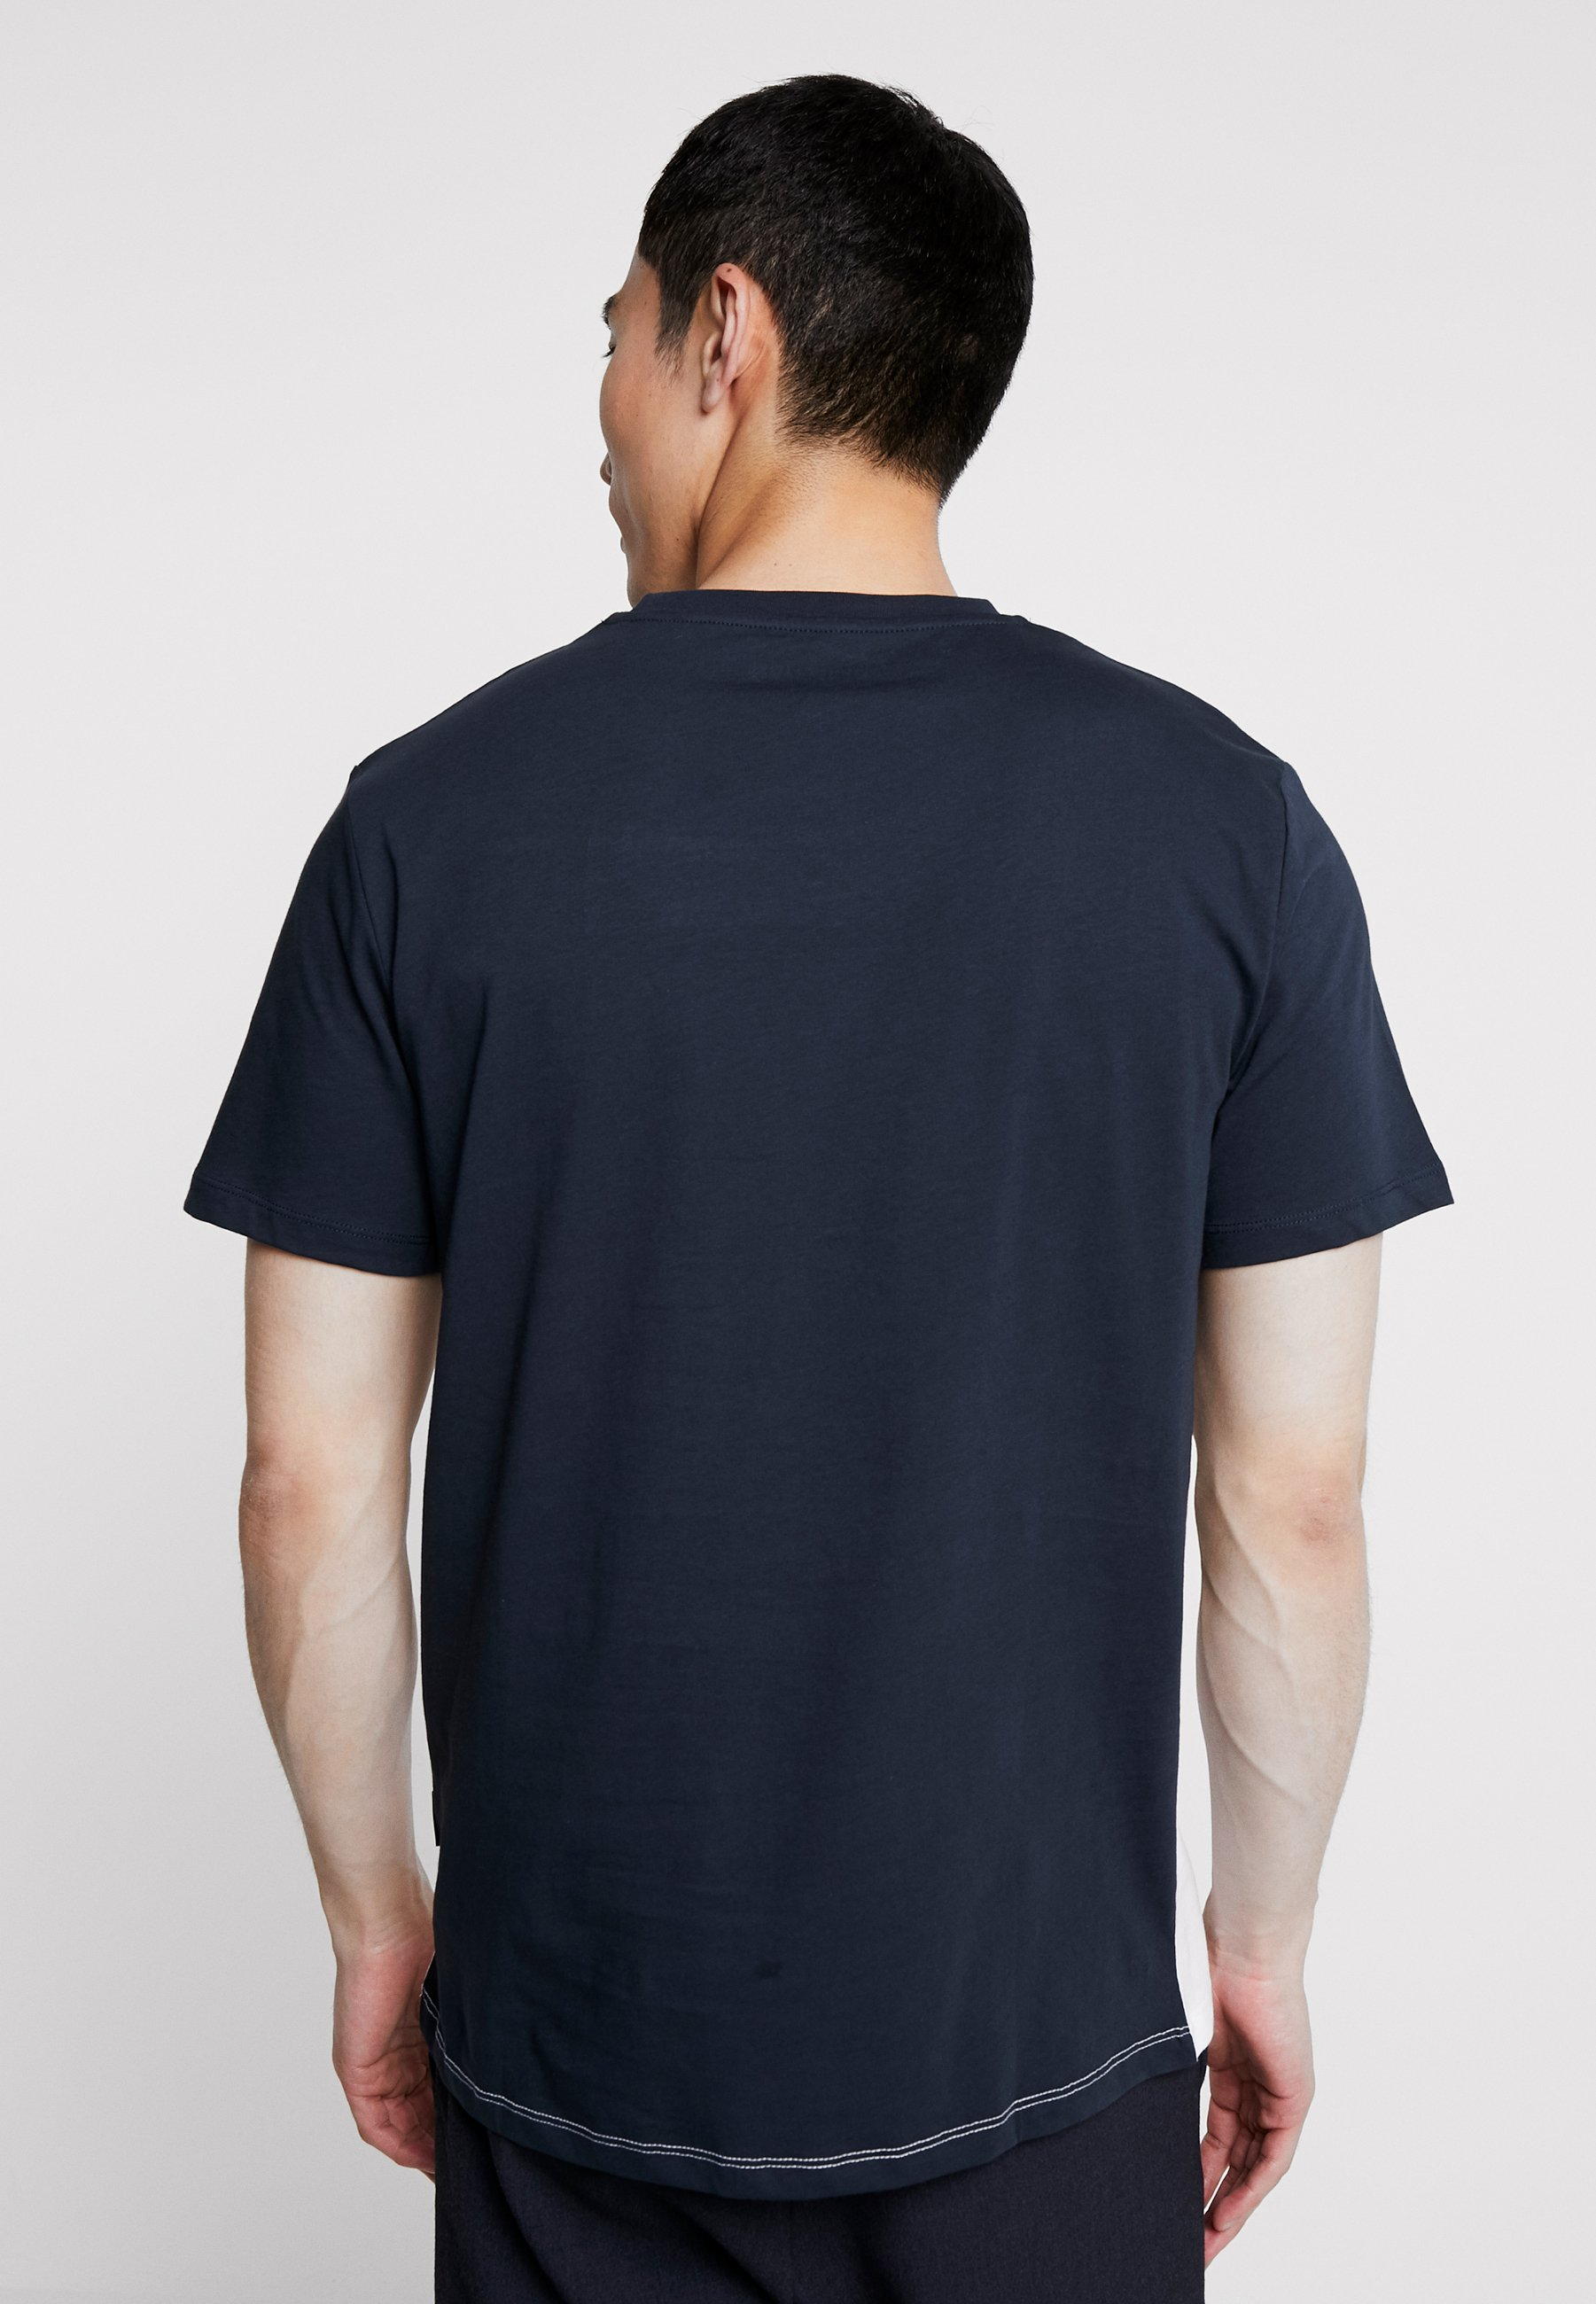 shirt T blue khaki Yourturn ImpriméWhite TlFJc5uK13